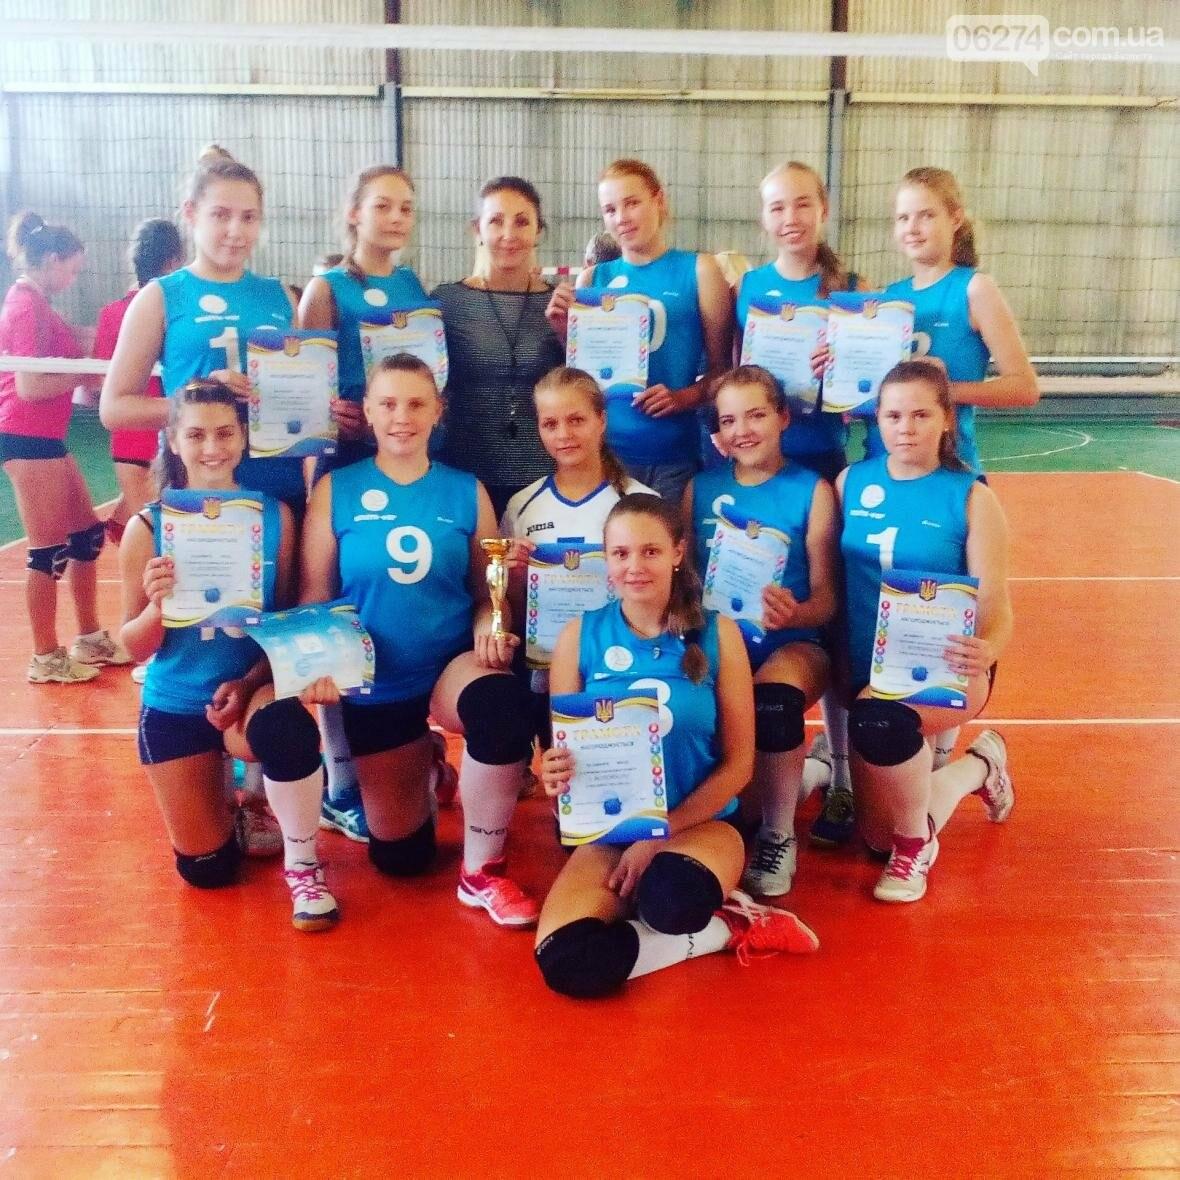 Волейболистки из Бахмута стали третьими на чемпионате области, фото-3